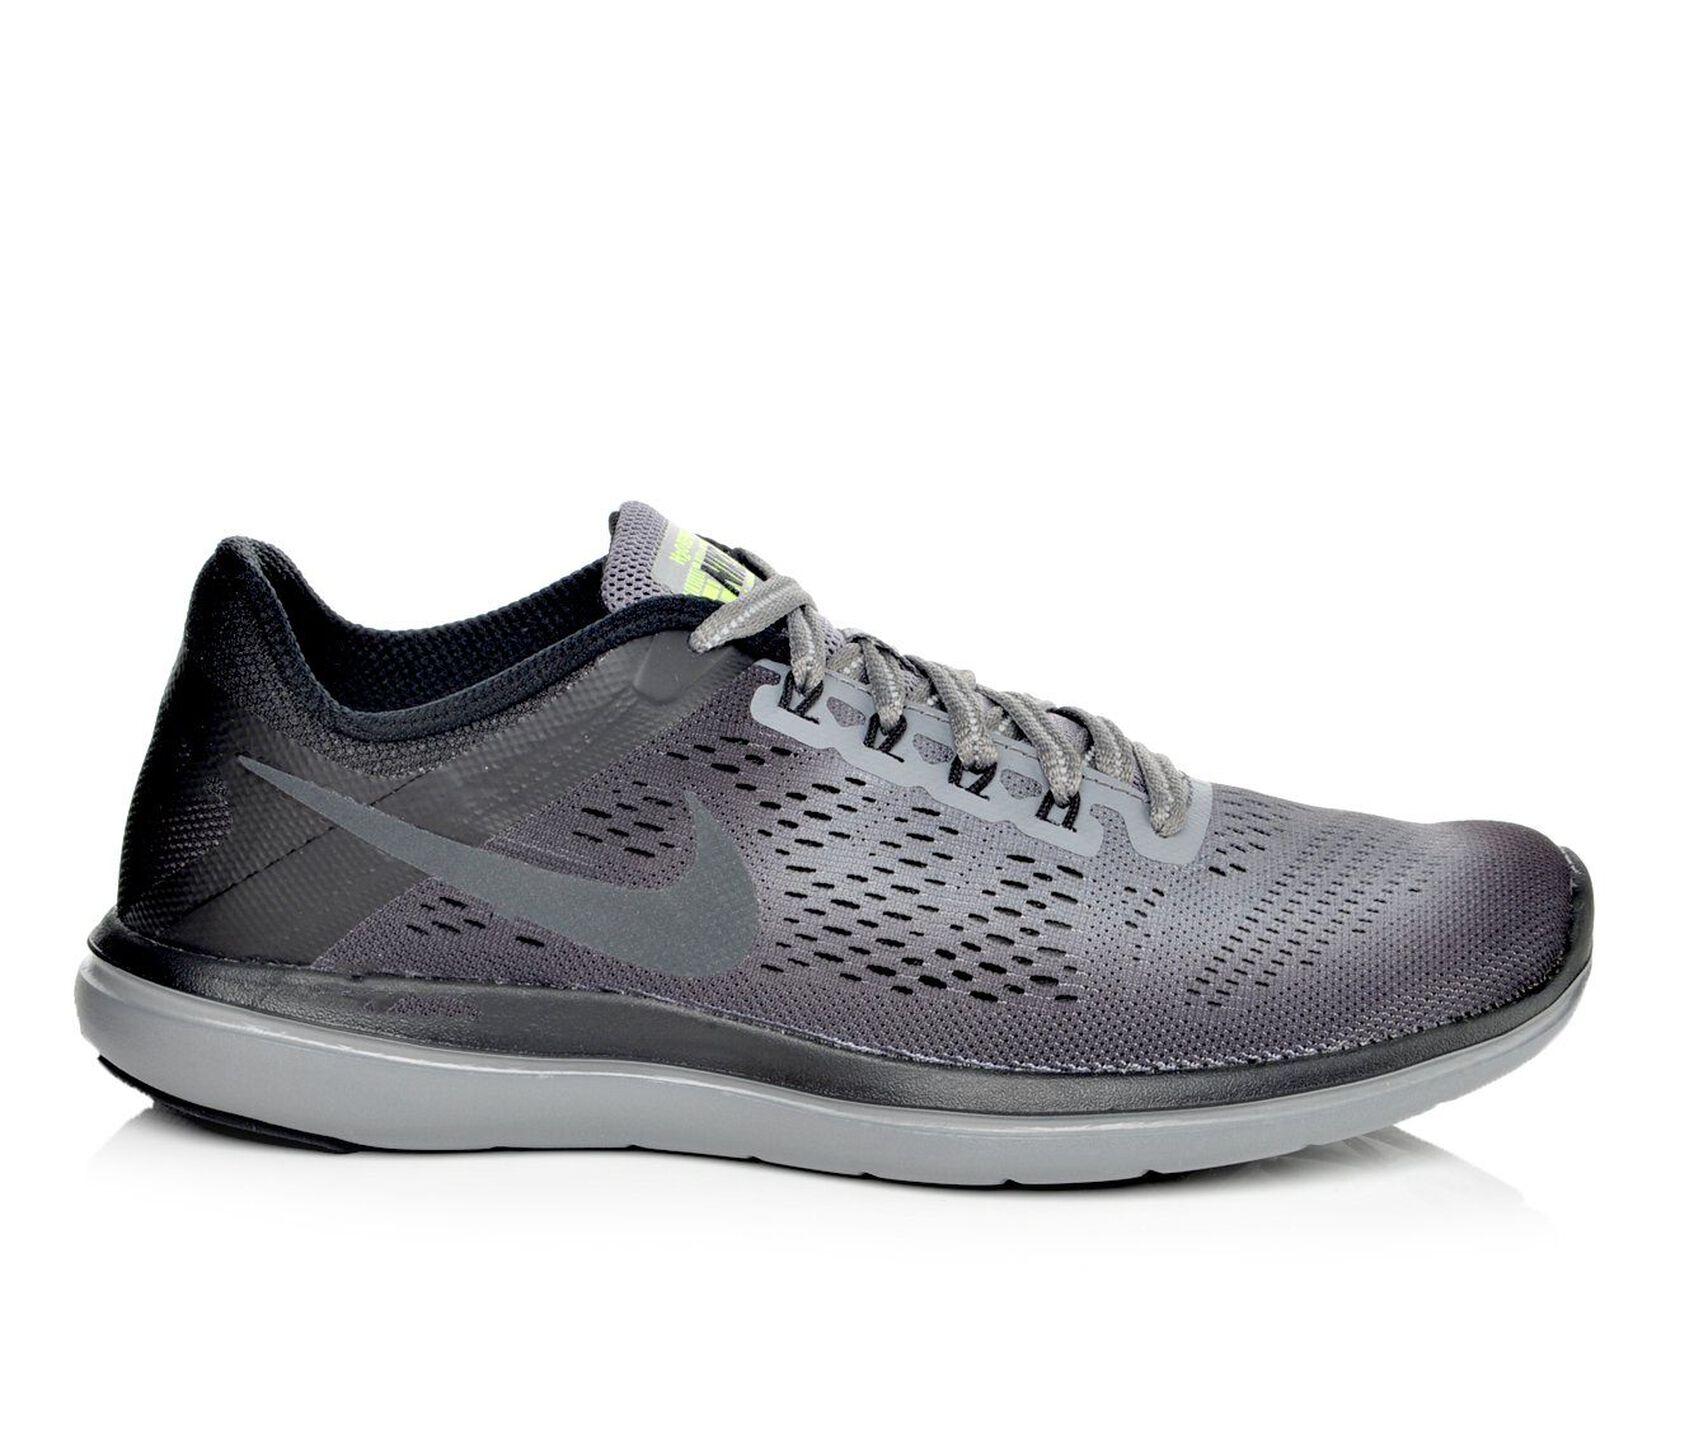 009030c957aef0 Women39s Flex 2015 RN Running Shoe Running Shoes and Nike